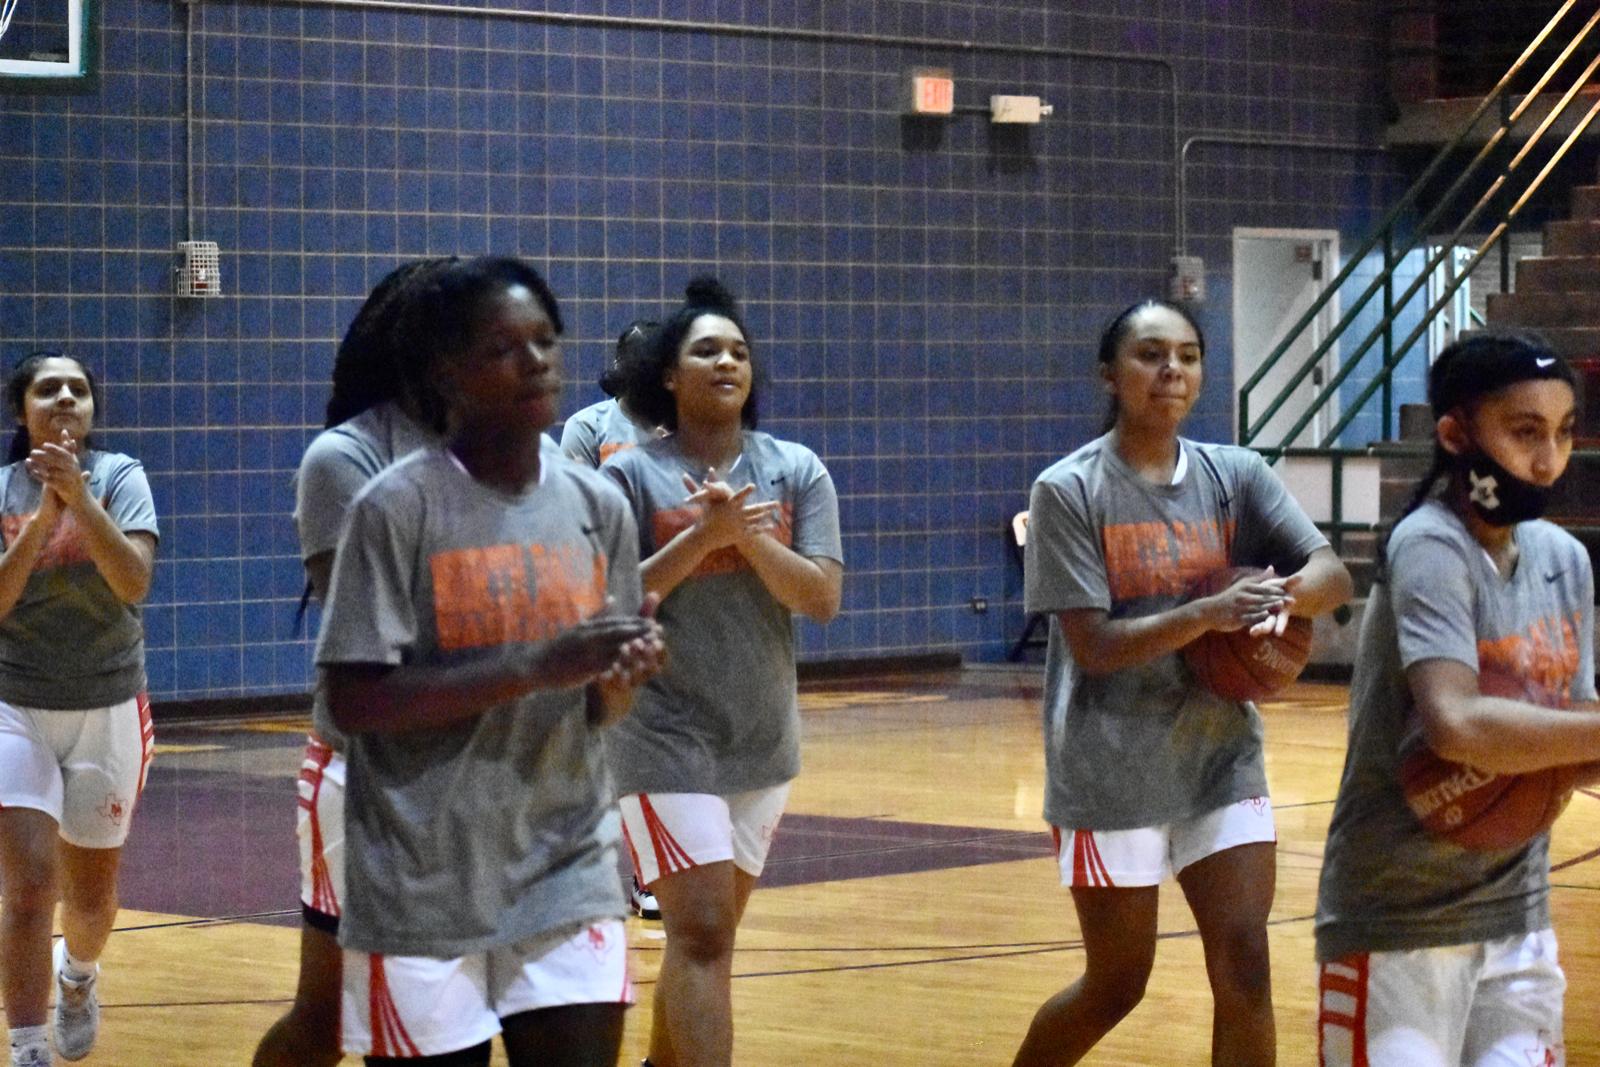 Photo gallery: North Dallas Lady Bulldogs warming up — Jan. 13, 2021